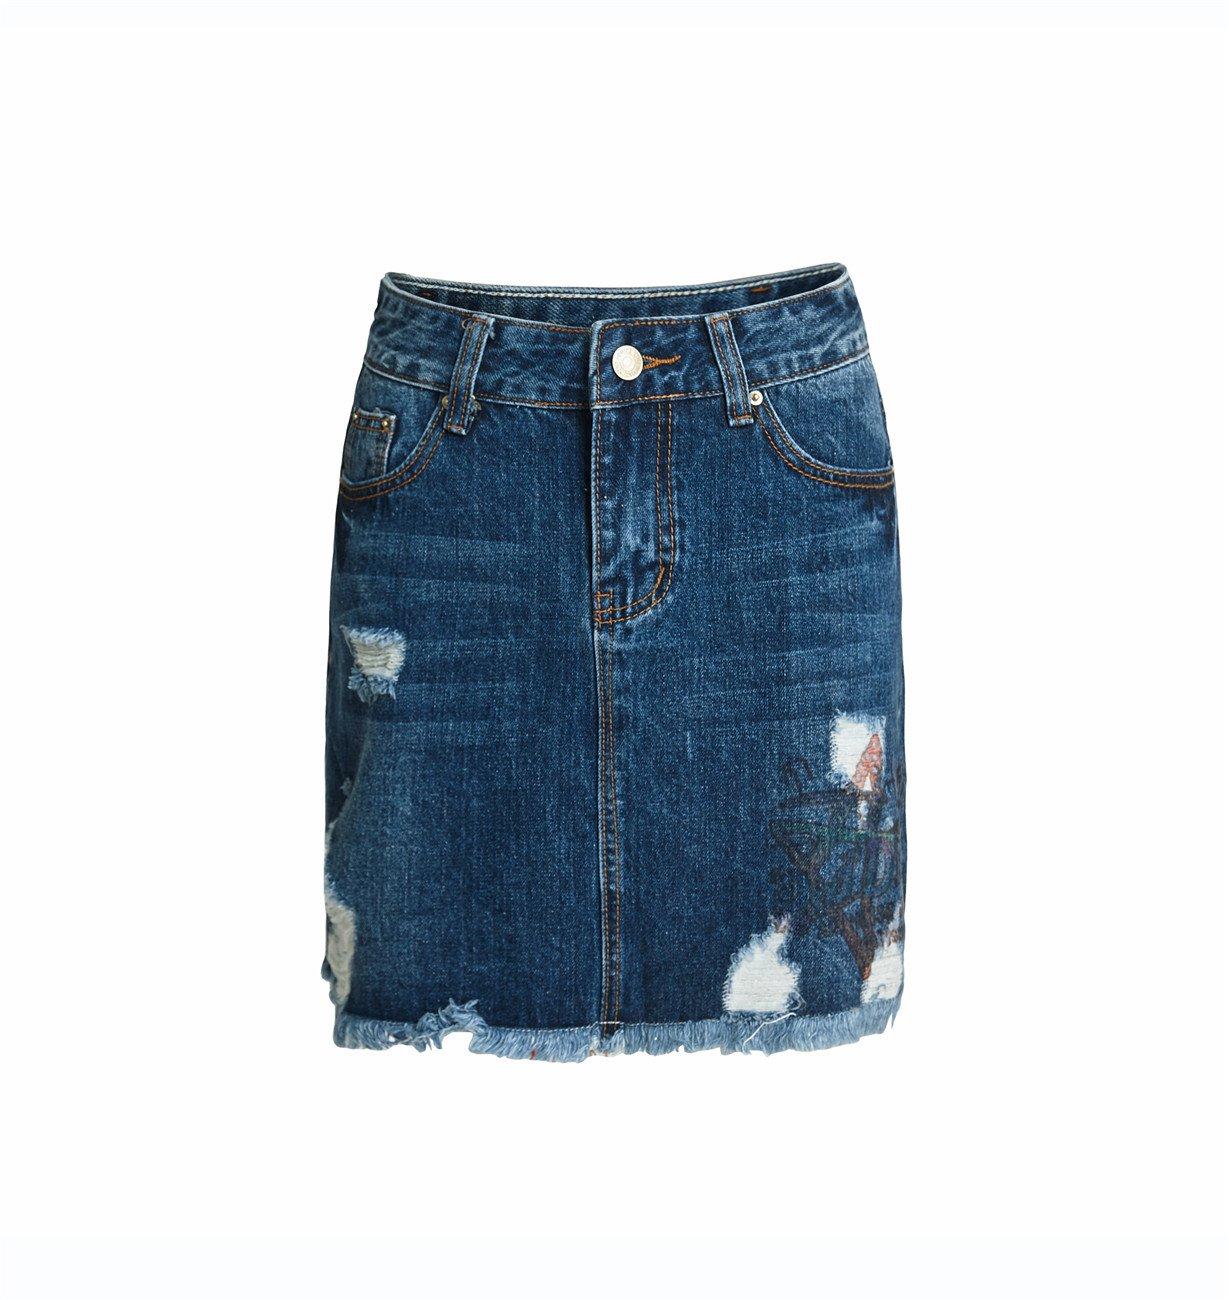 Women's Casual Distressed Ripped A-Line Denim Short Skirt (Navy Blue, Medium)